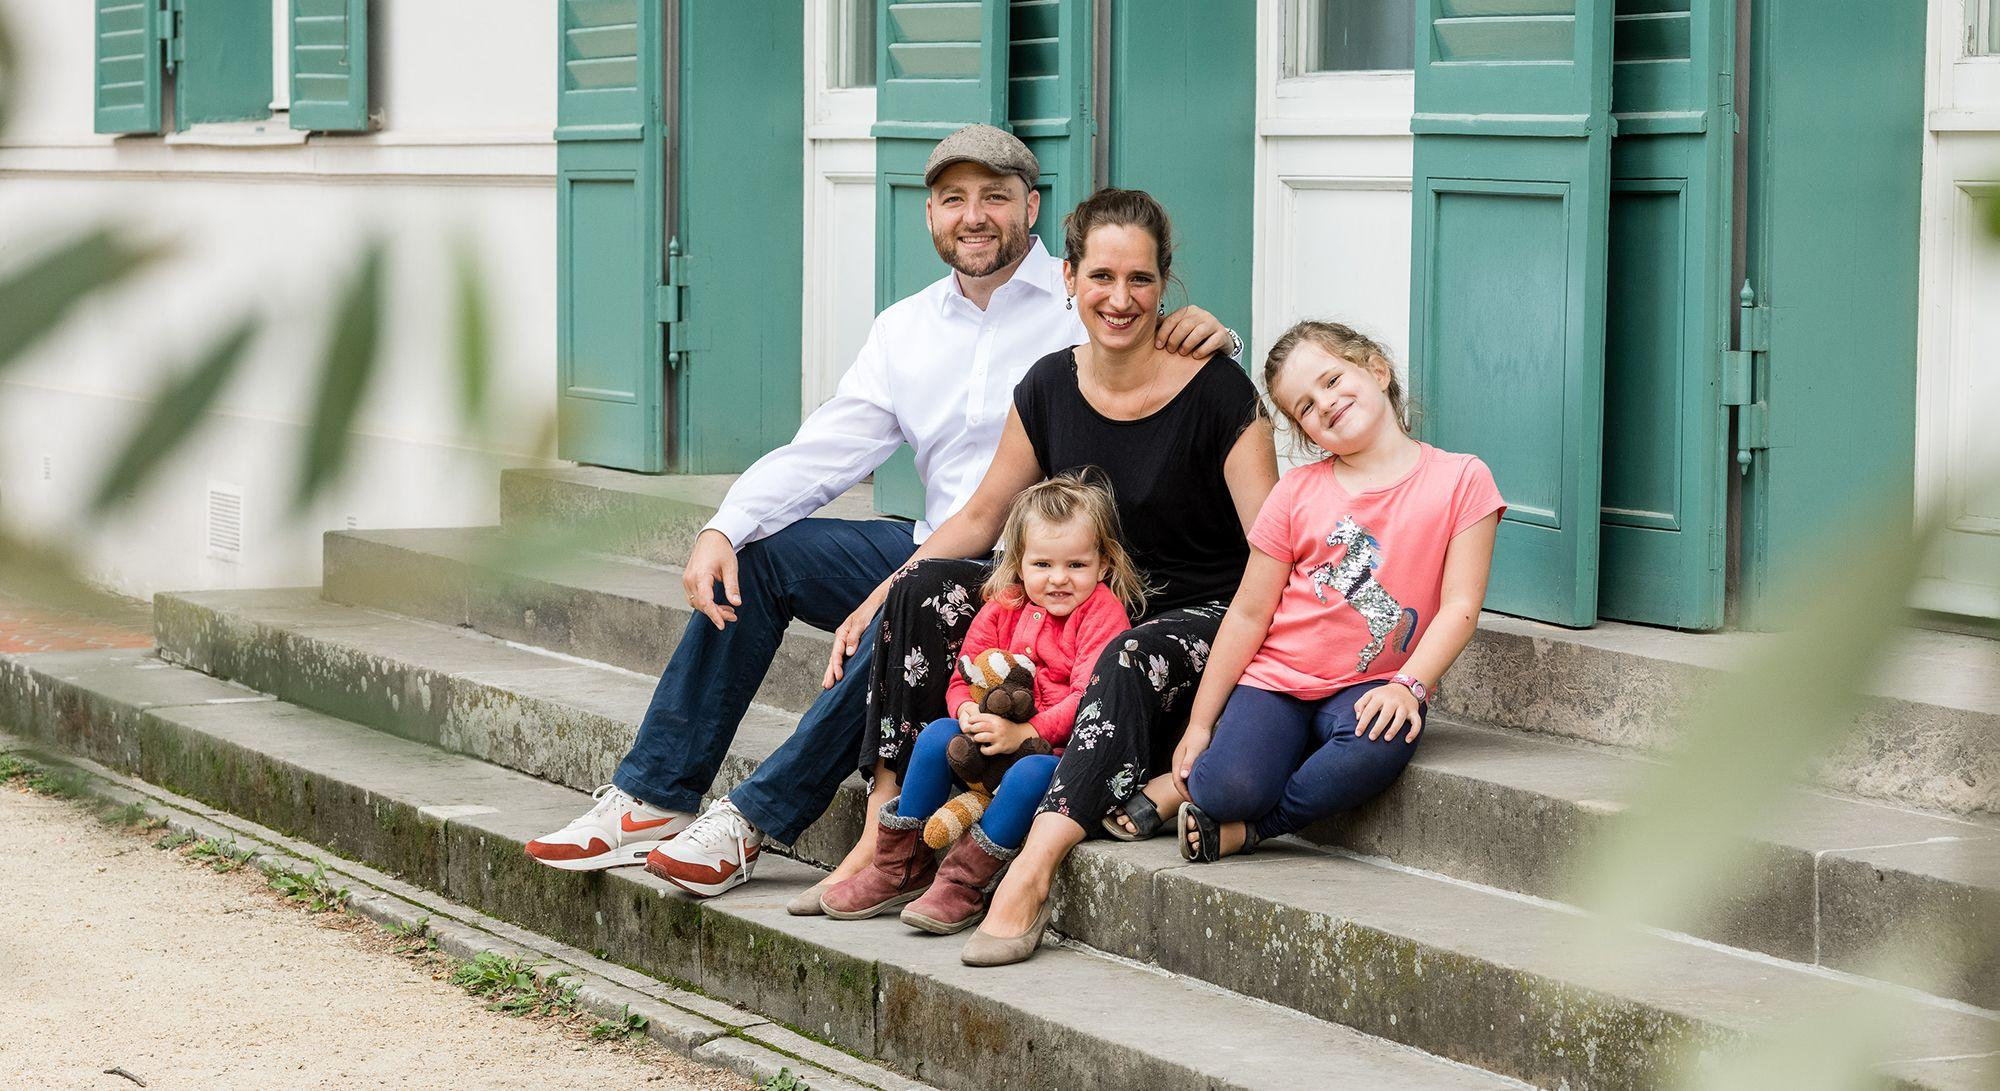 photografic, familienfotos, familienshooting, outdoorshooting, fotograf Berlin, fotograf wilmersdorf, fotostudio charlottenbrug, vivian werk